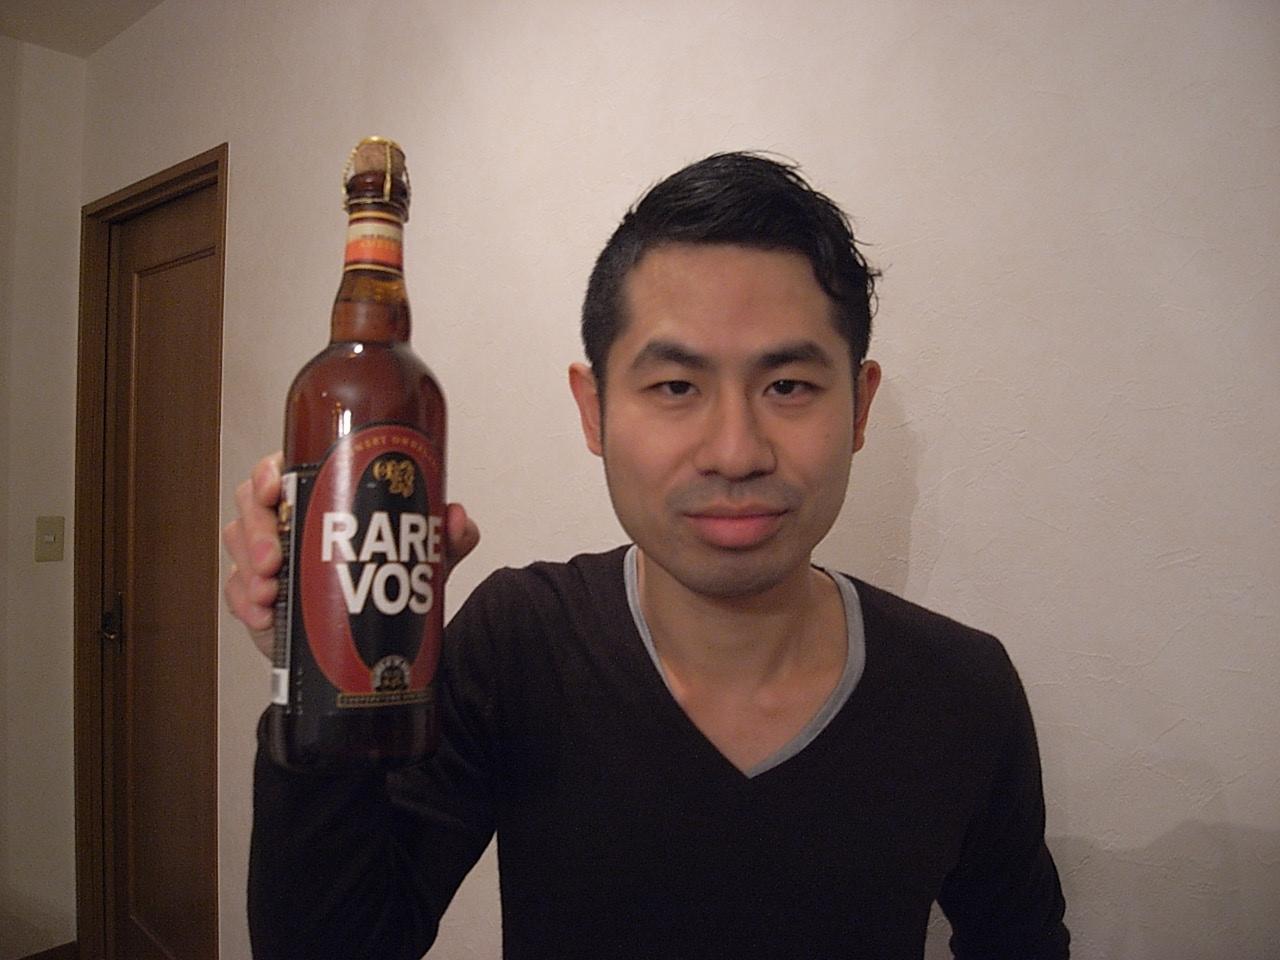 「Rare Vos」NYビール!_e0230090_0214223.jpg